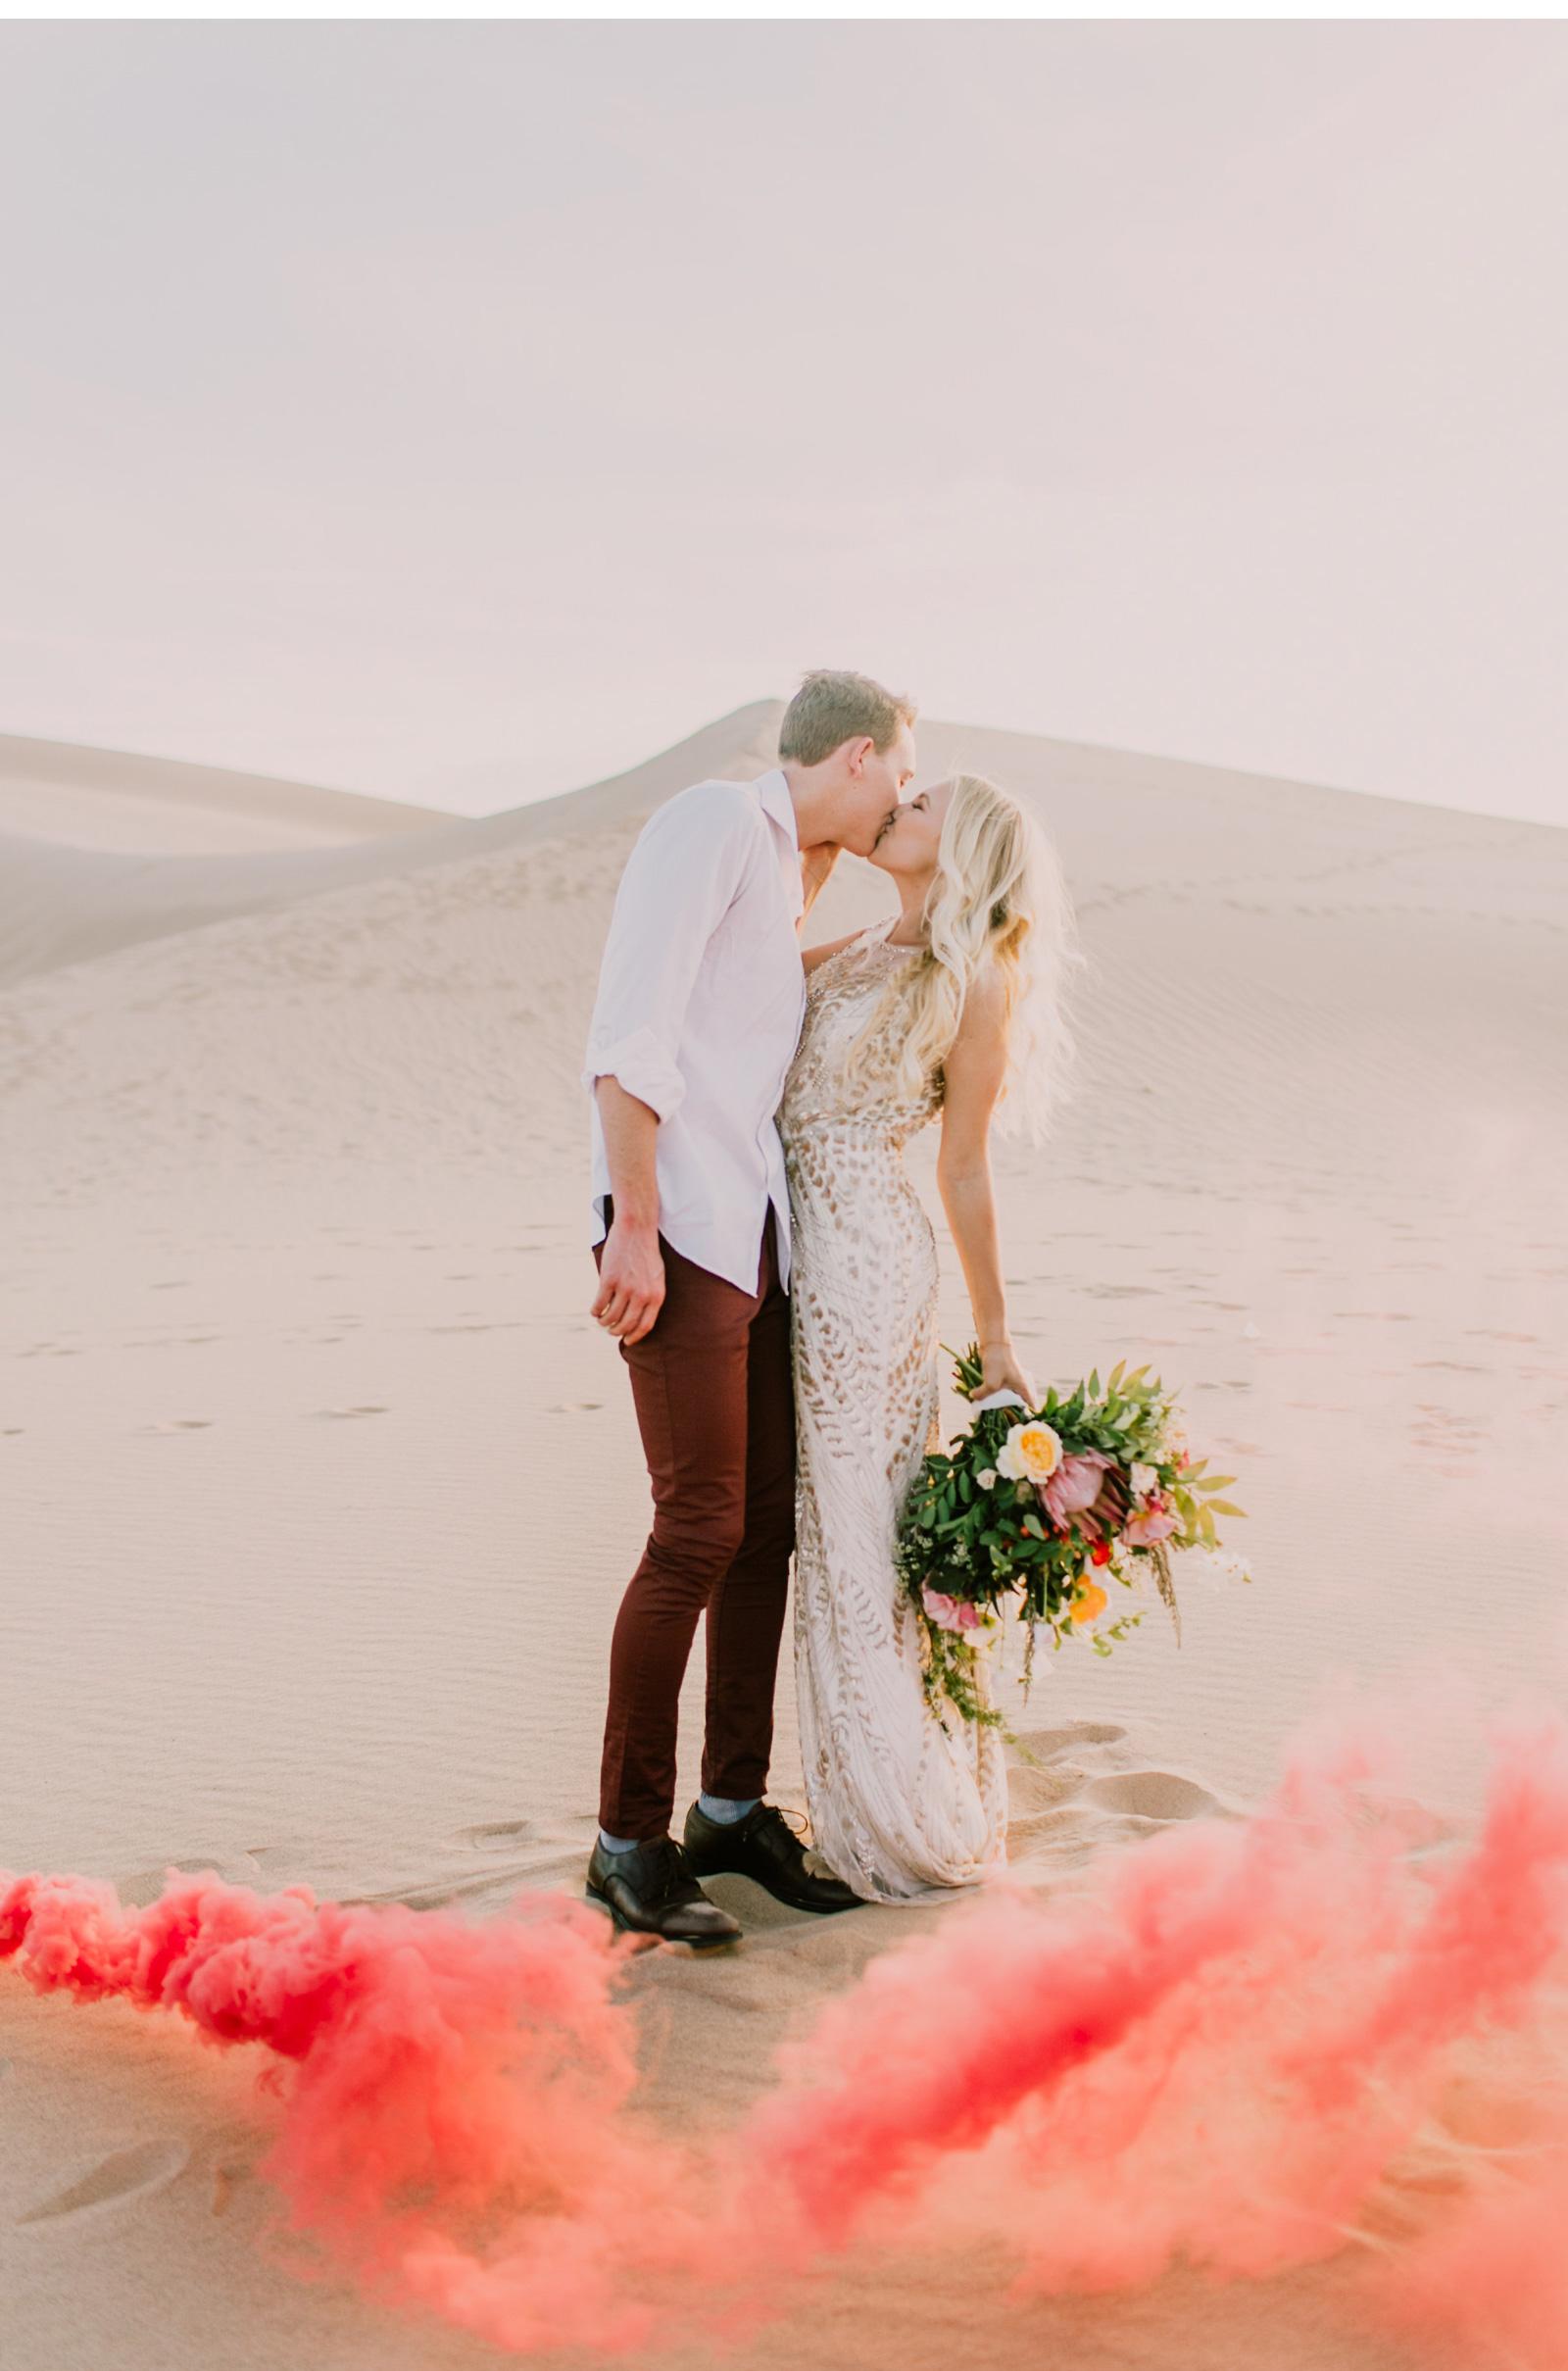 Desert-Wedding-Free-People-Wedding-Natalie-Schutt-Photography_02.jpg